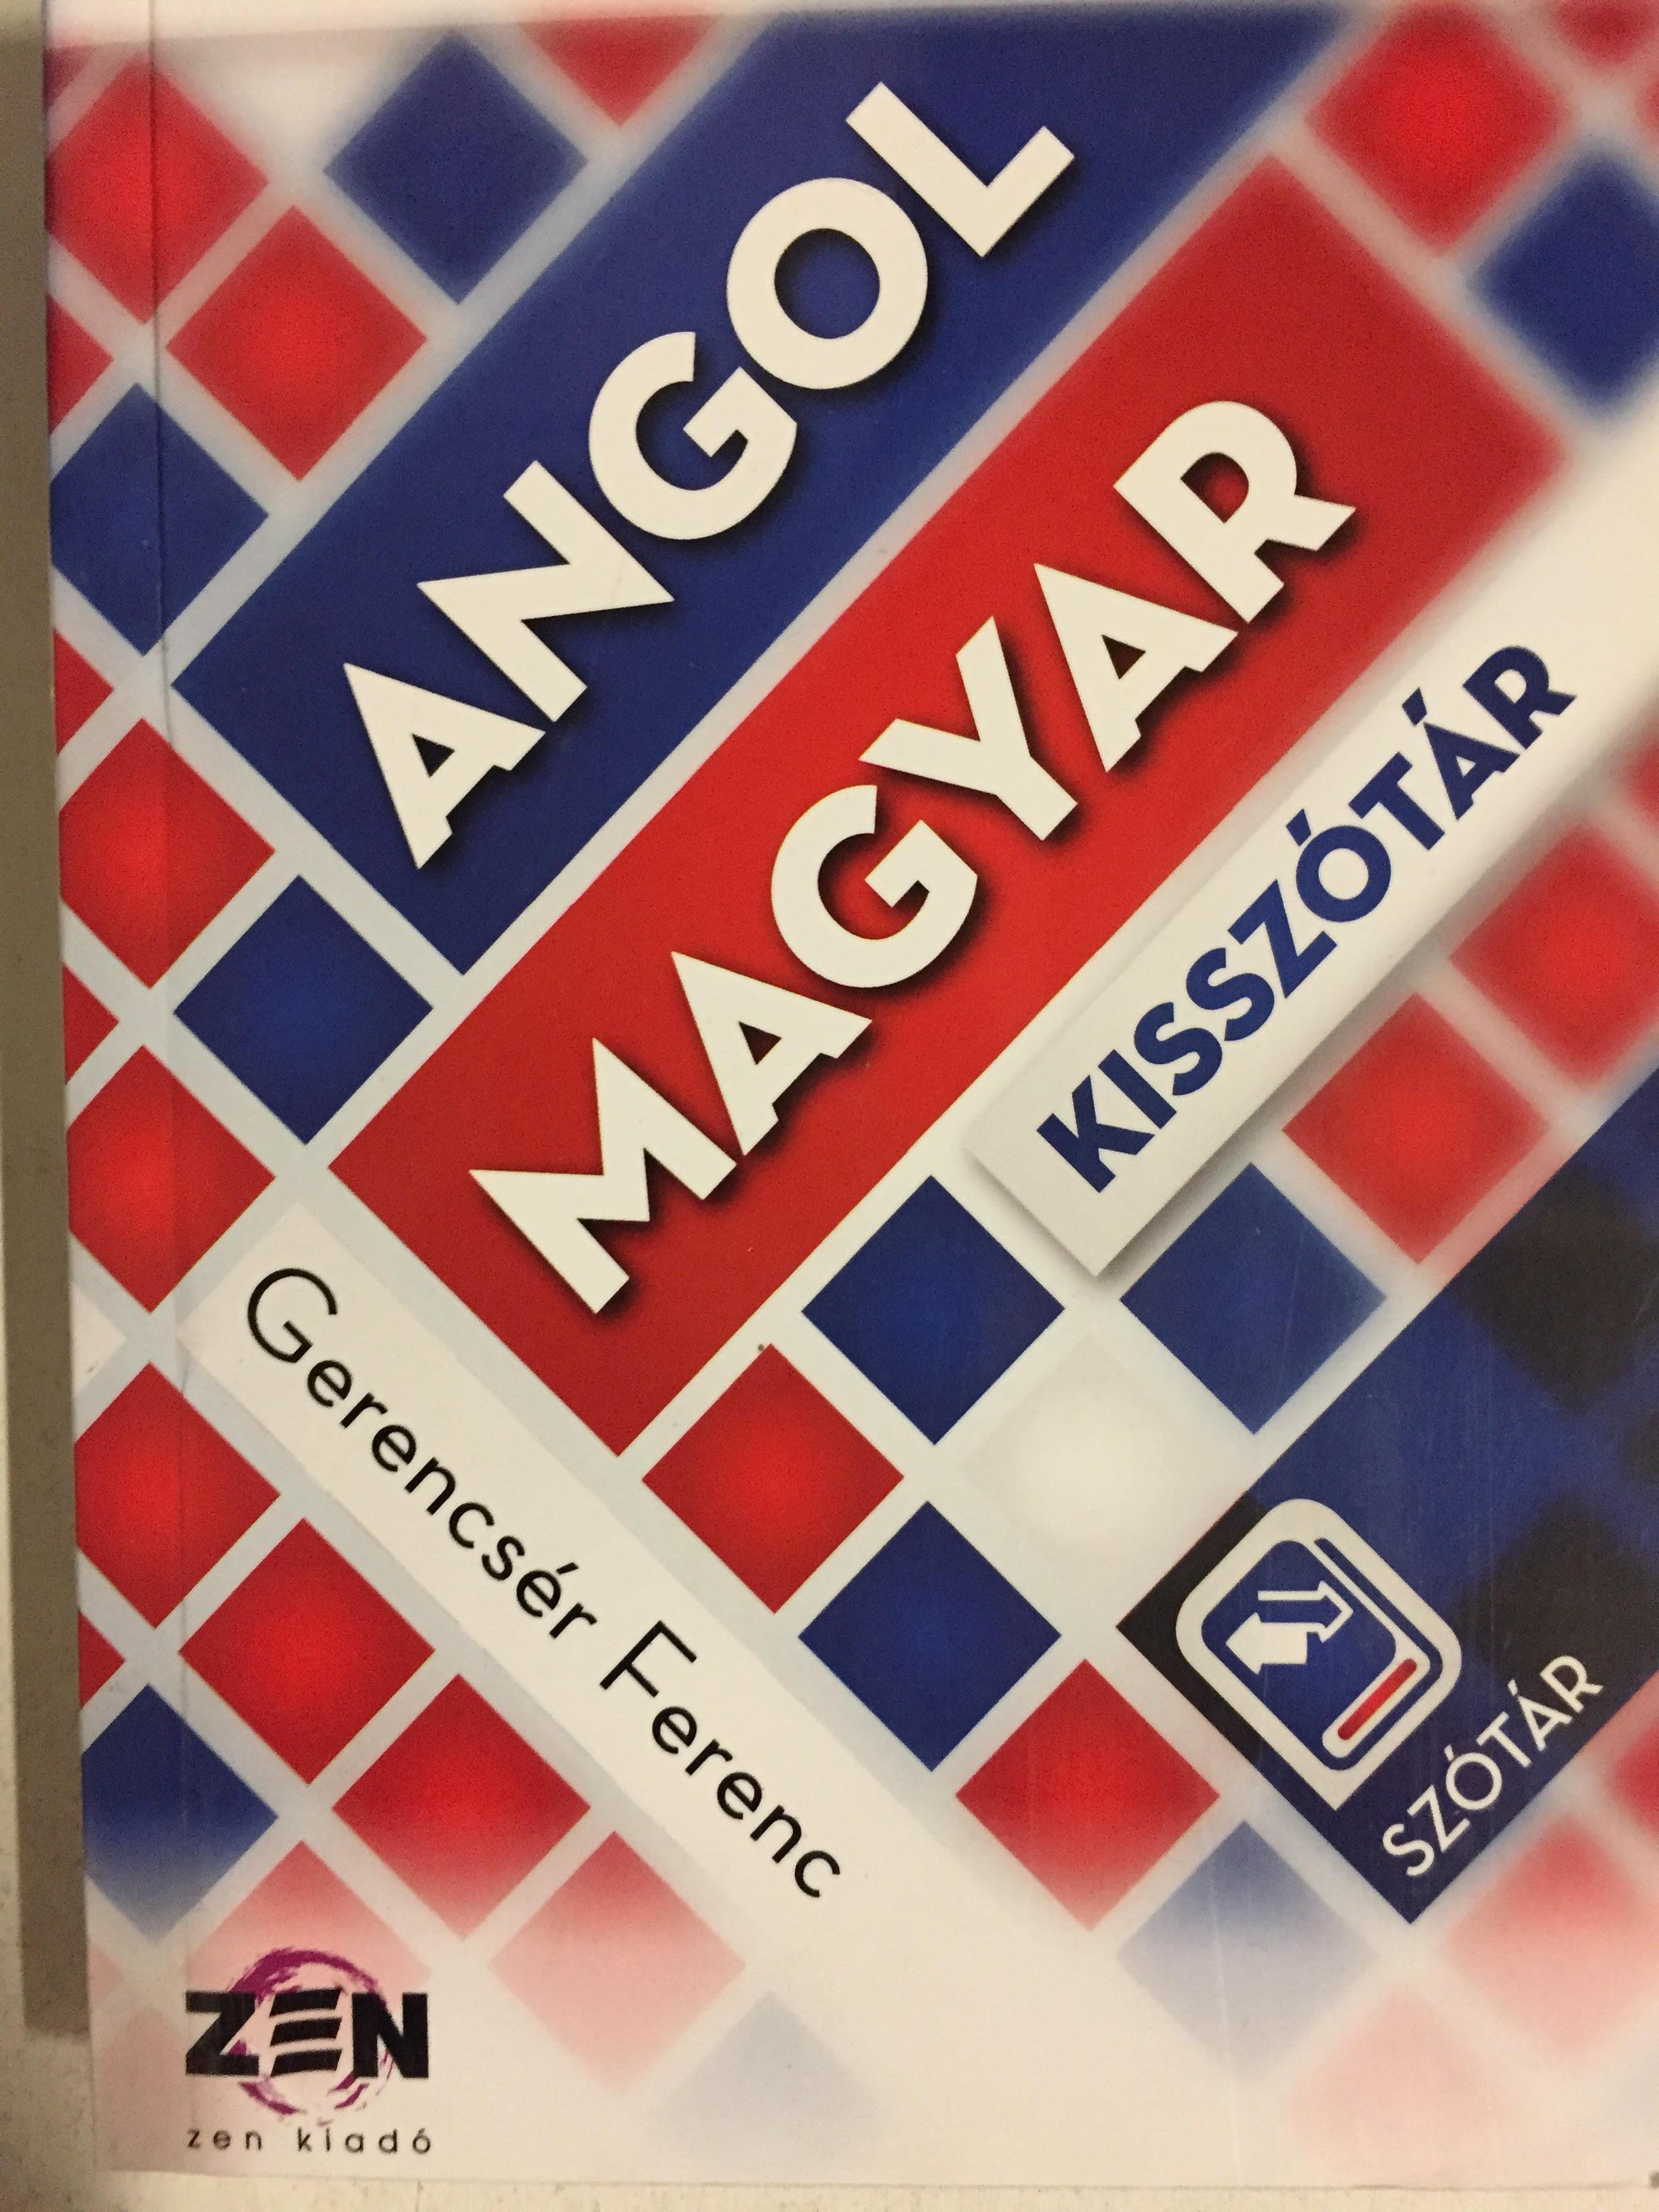 GERENCSÉR FERENC - MAGYAR-ANGOL, ANGOL-MAGYAR KISSZÓTÁR